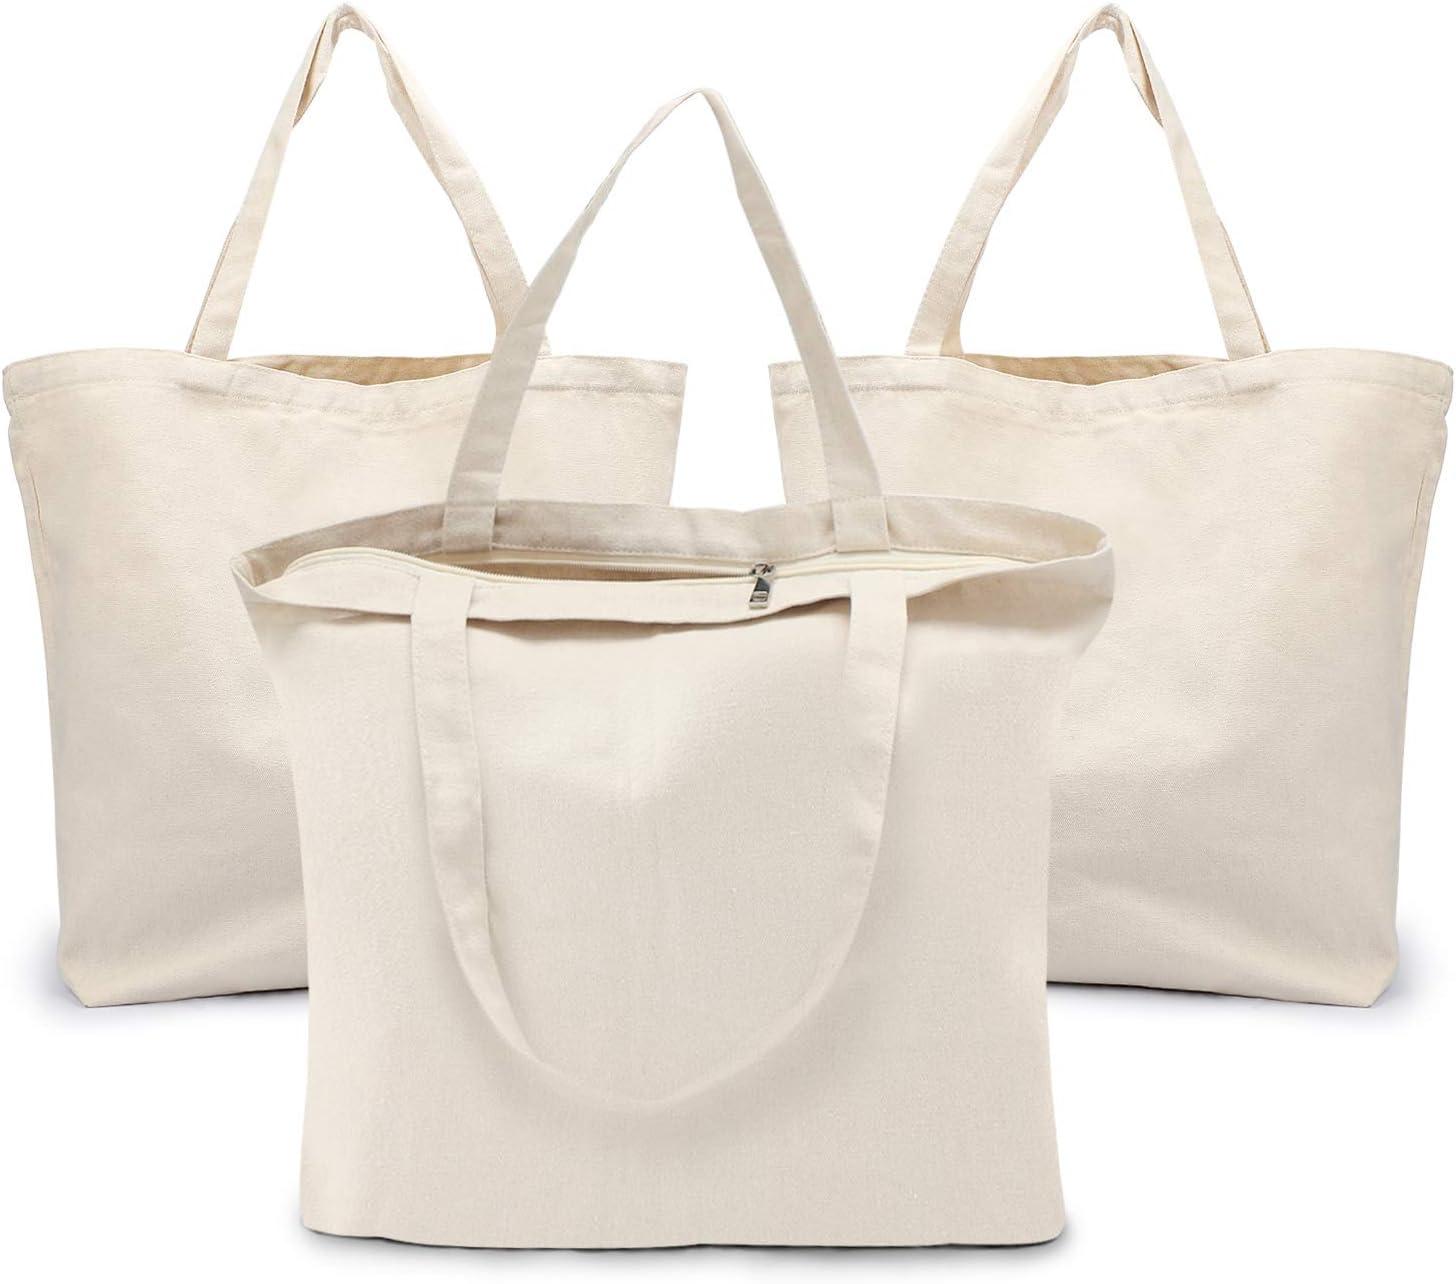 Hobo Style Bag Washable Shoping Bag Canvas Over the Shoulder Bag Over the Shoulder Purse Reusable Bag Cotton Shopping bag Canvas Purse